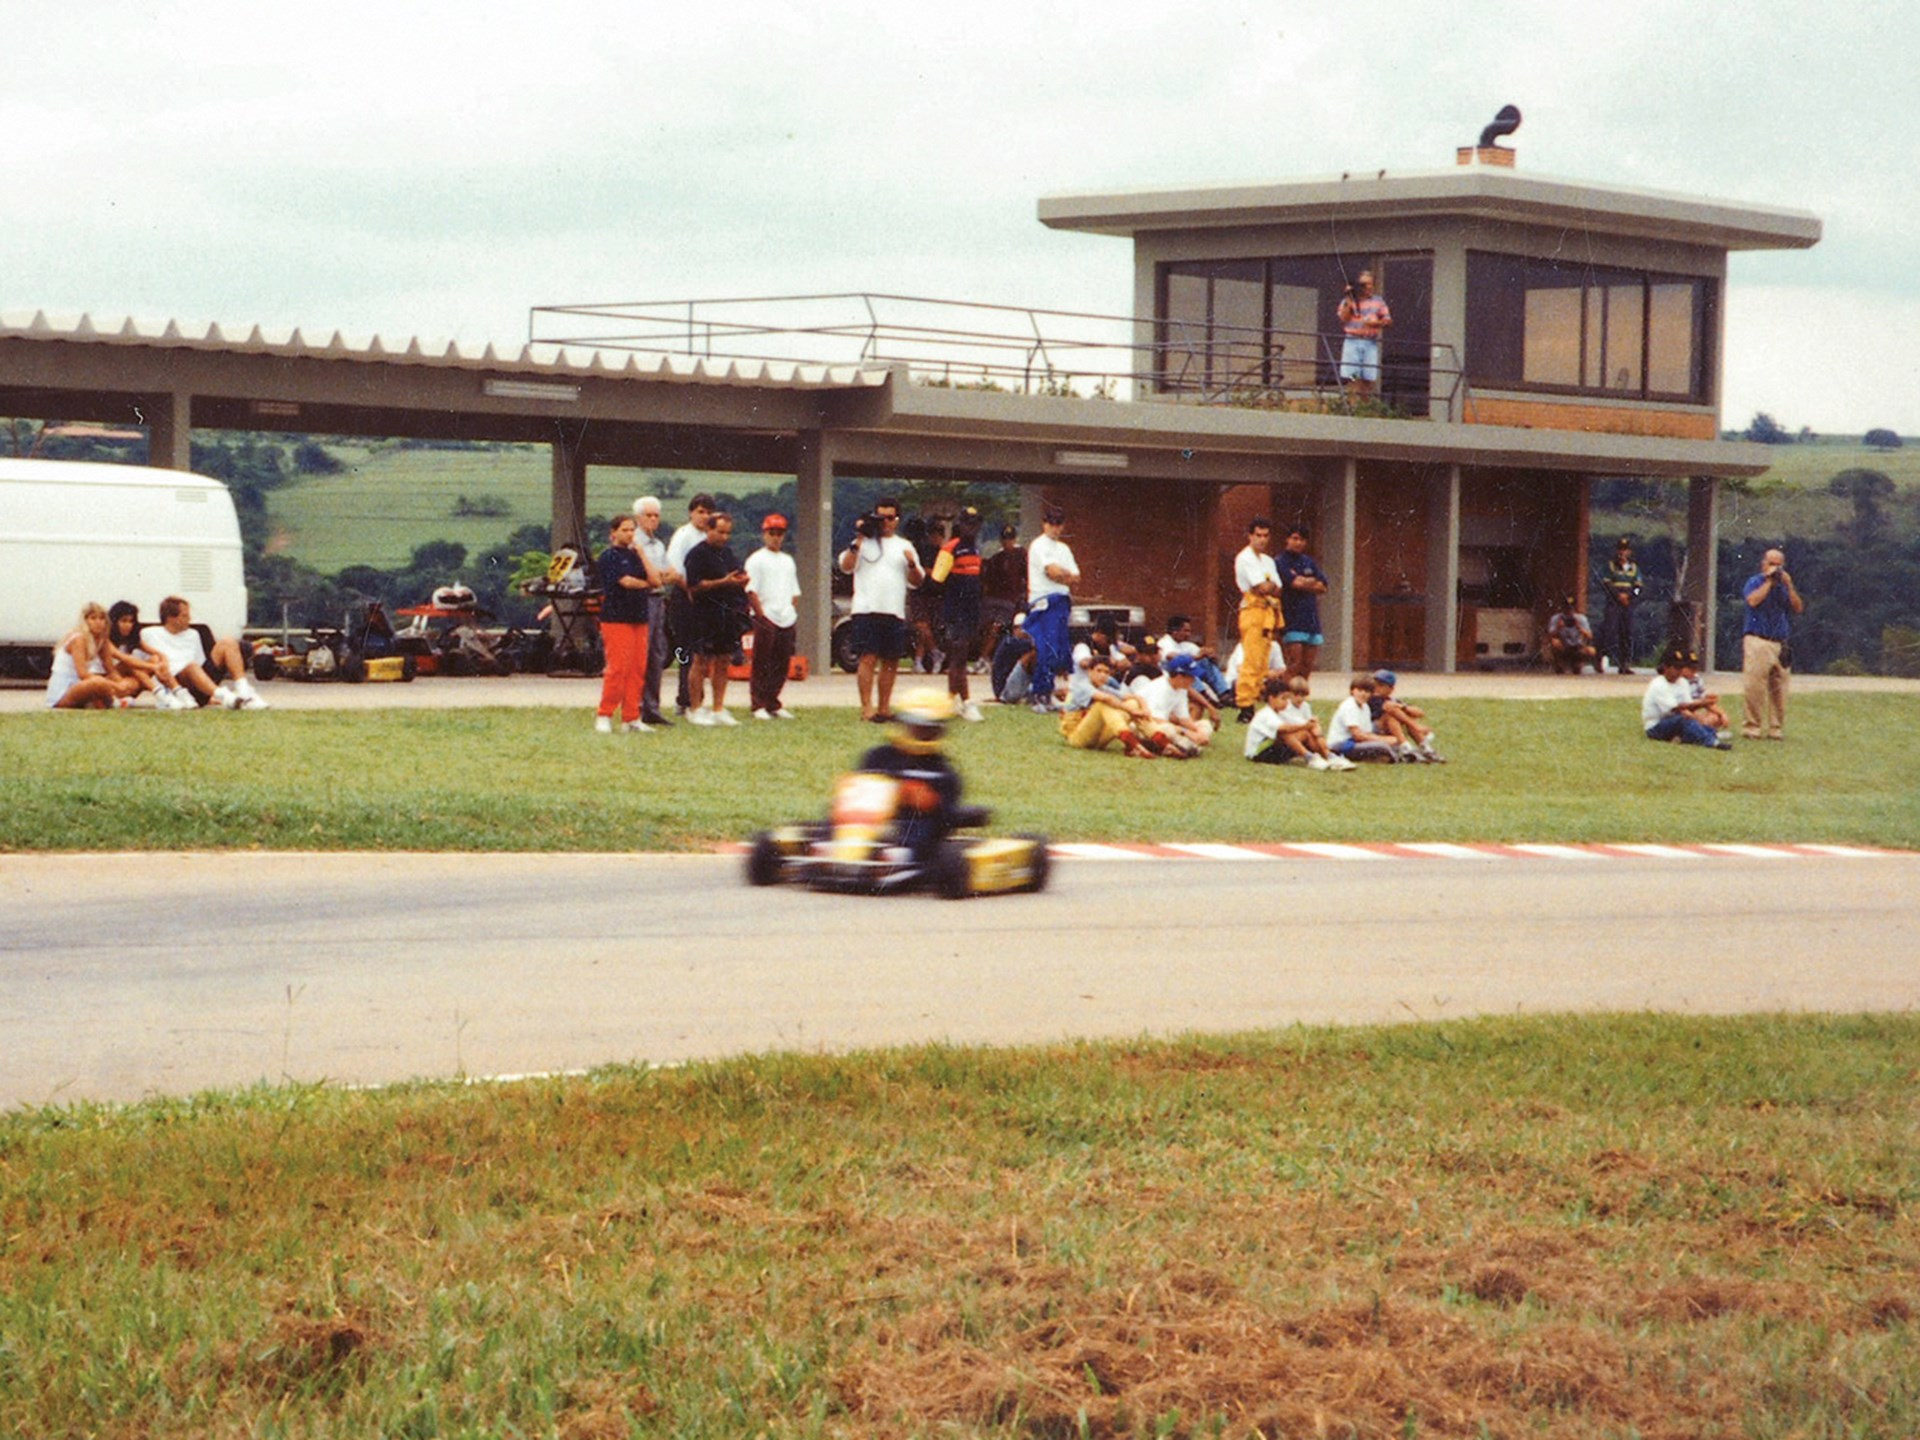 Senna driving the kart on his track.